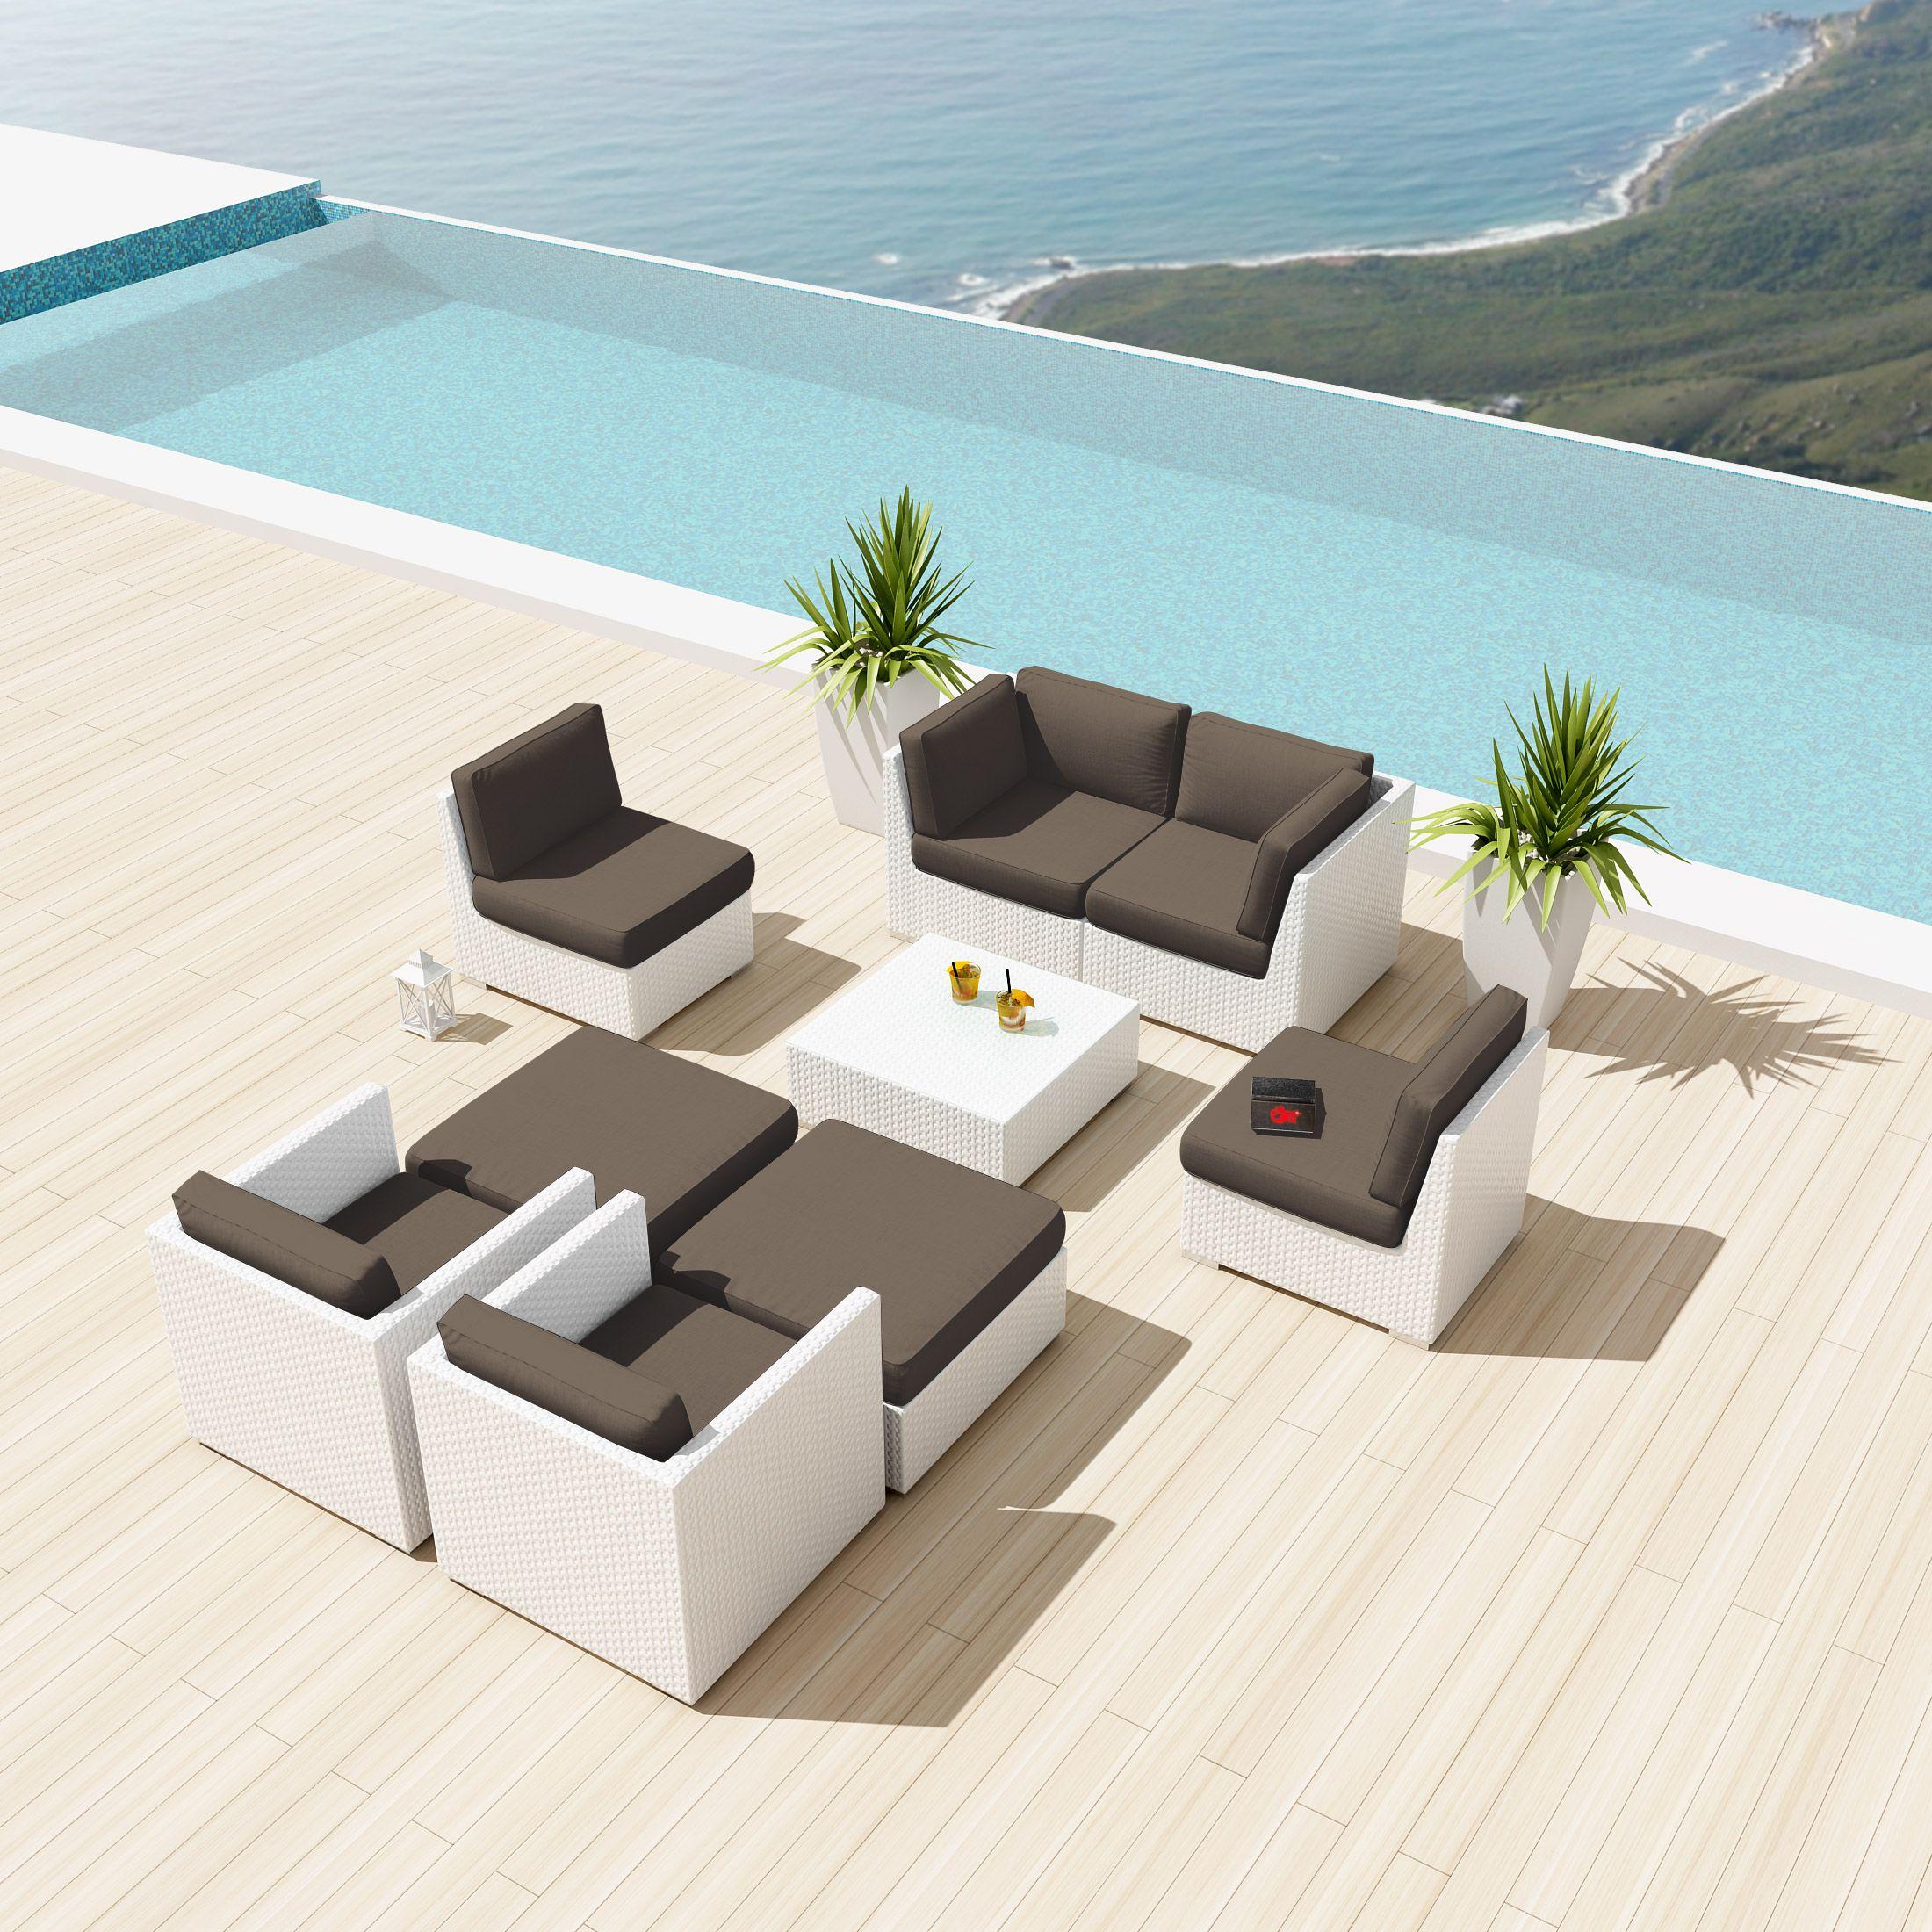 Uduka Bangalore 9 pcs Outdoor Sectional Patio Furniture Sofa Set